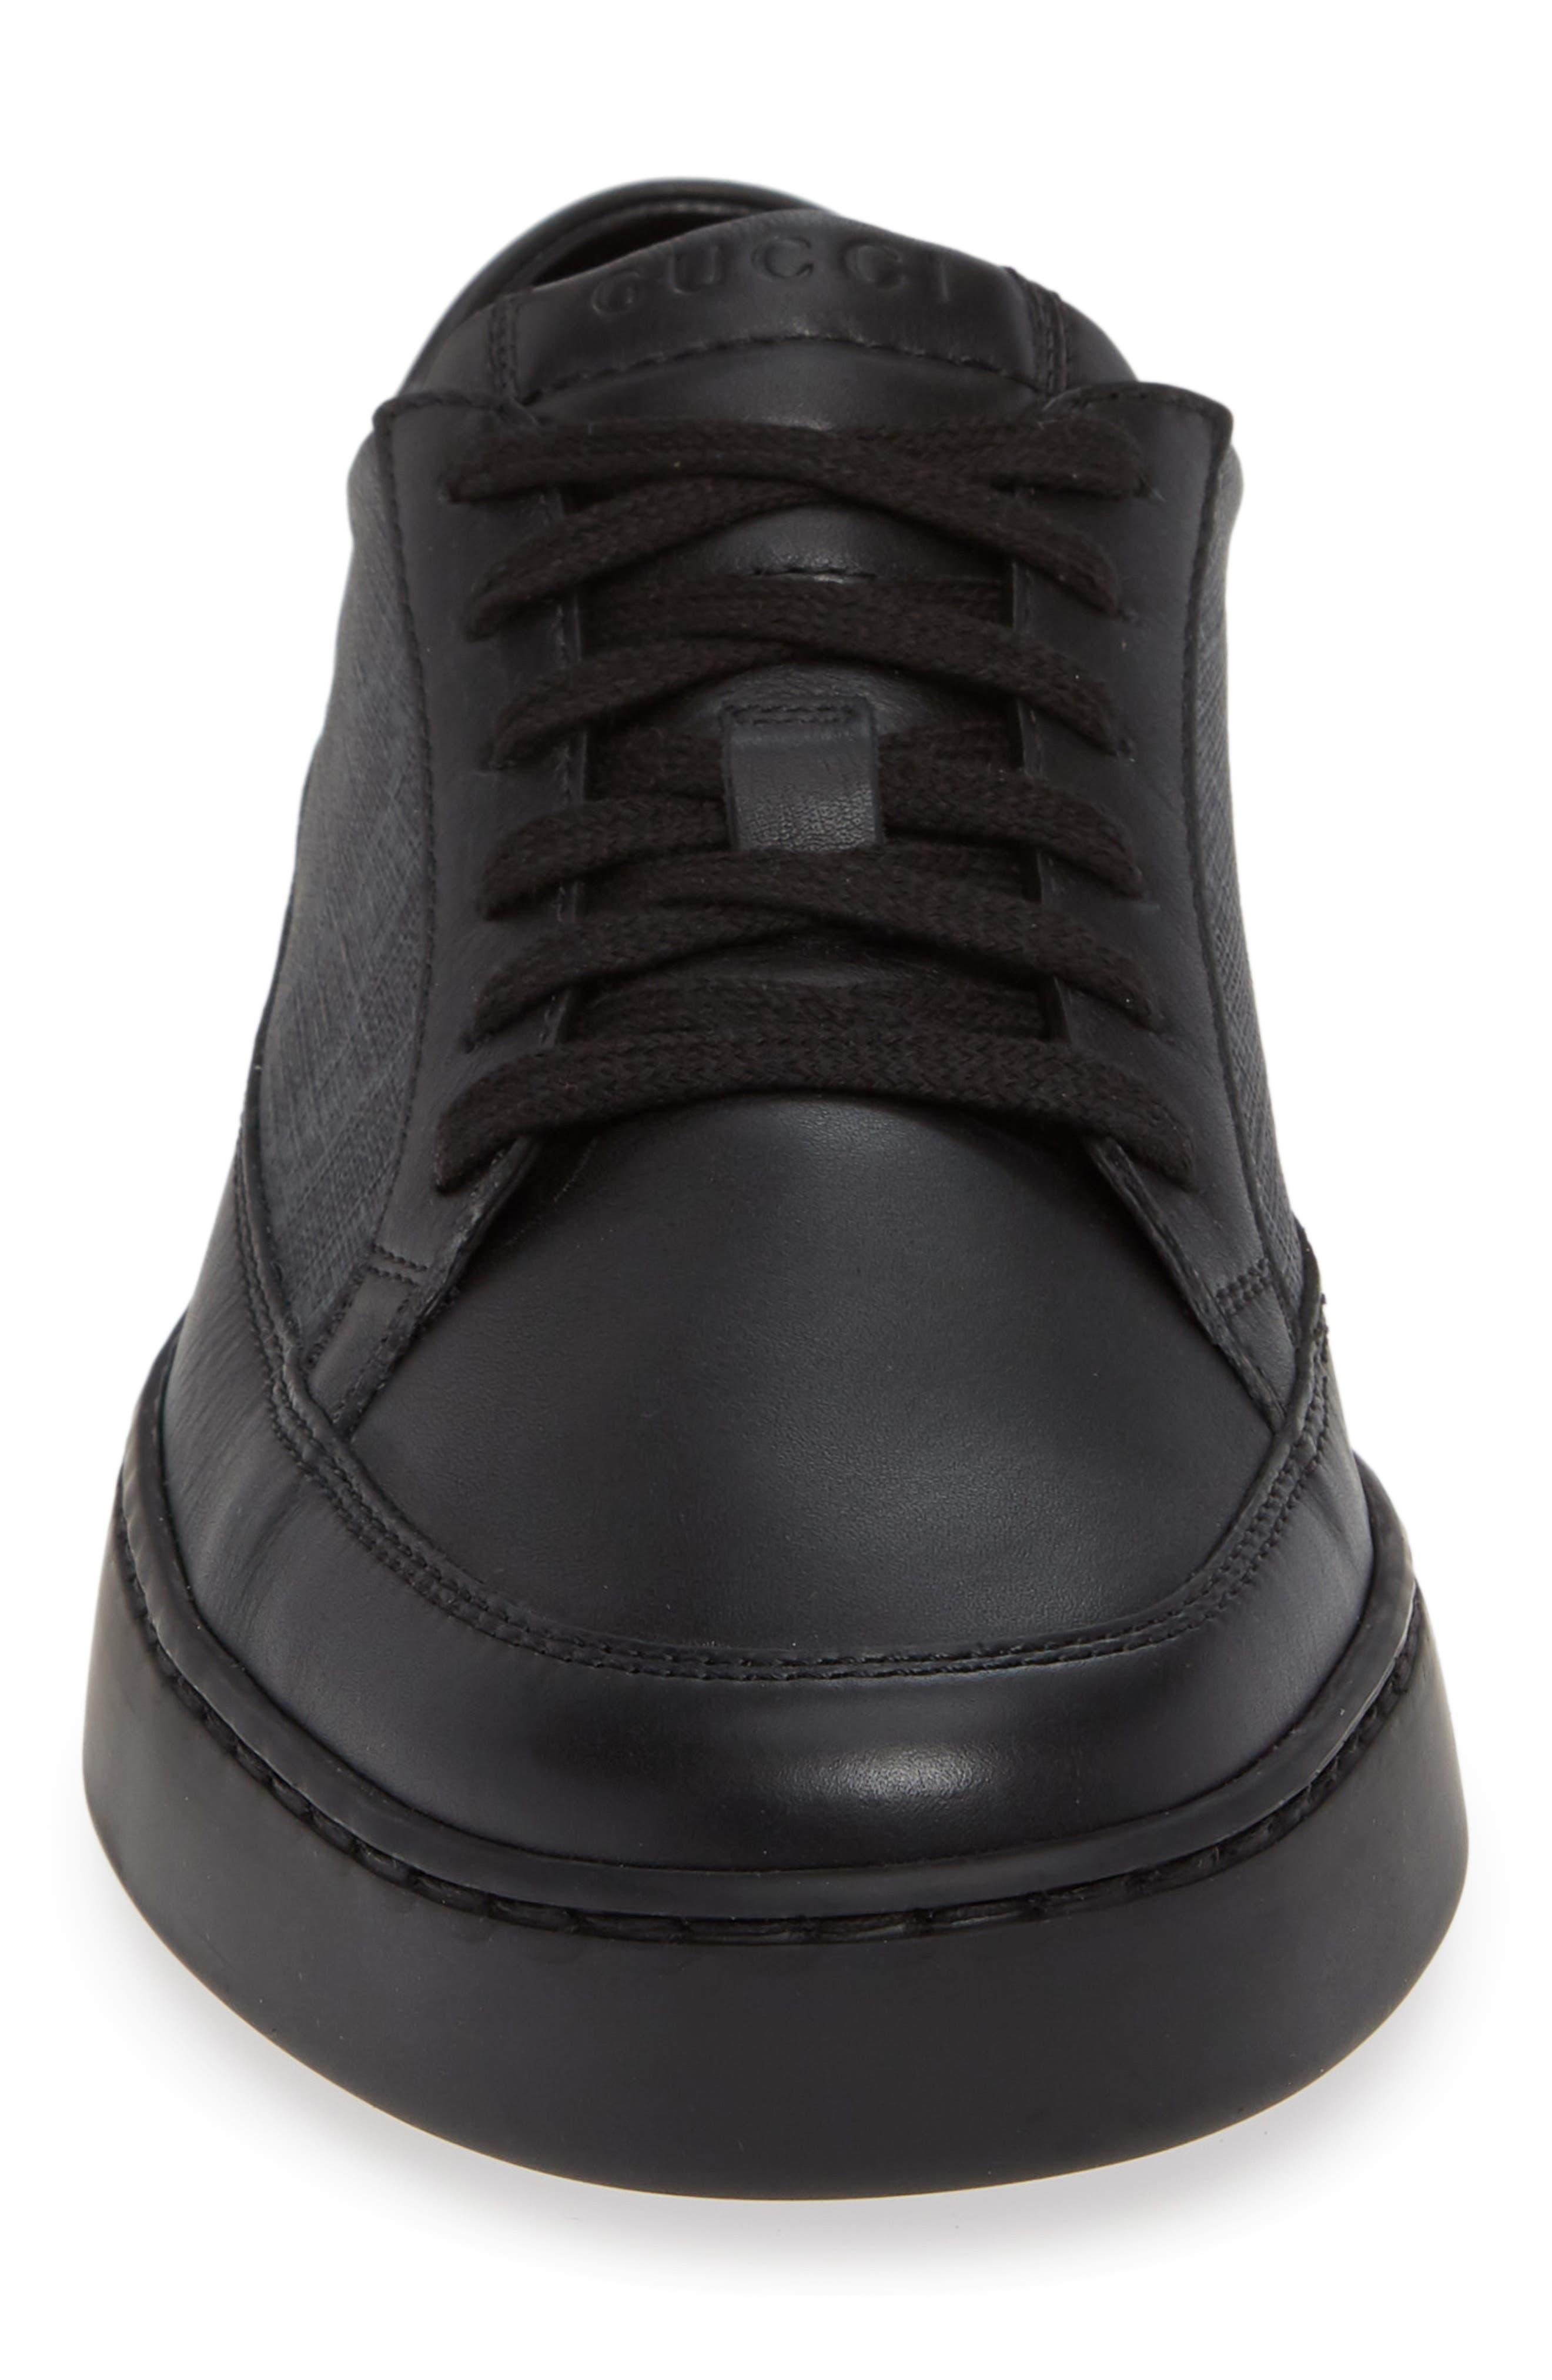 'Common' Low-Top Sneaker,                             Alternate thumbnail 4, color,                             NERO/ BLACK